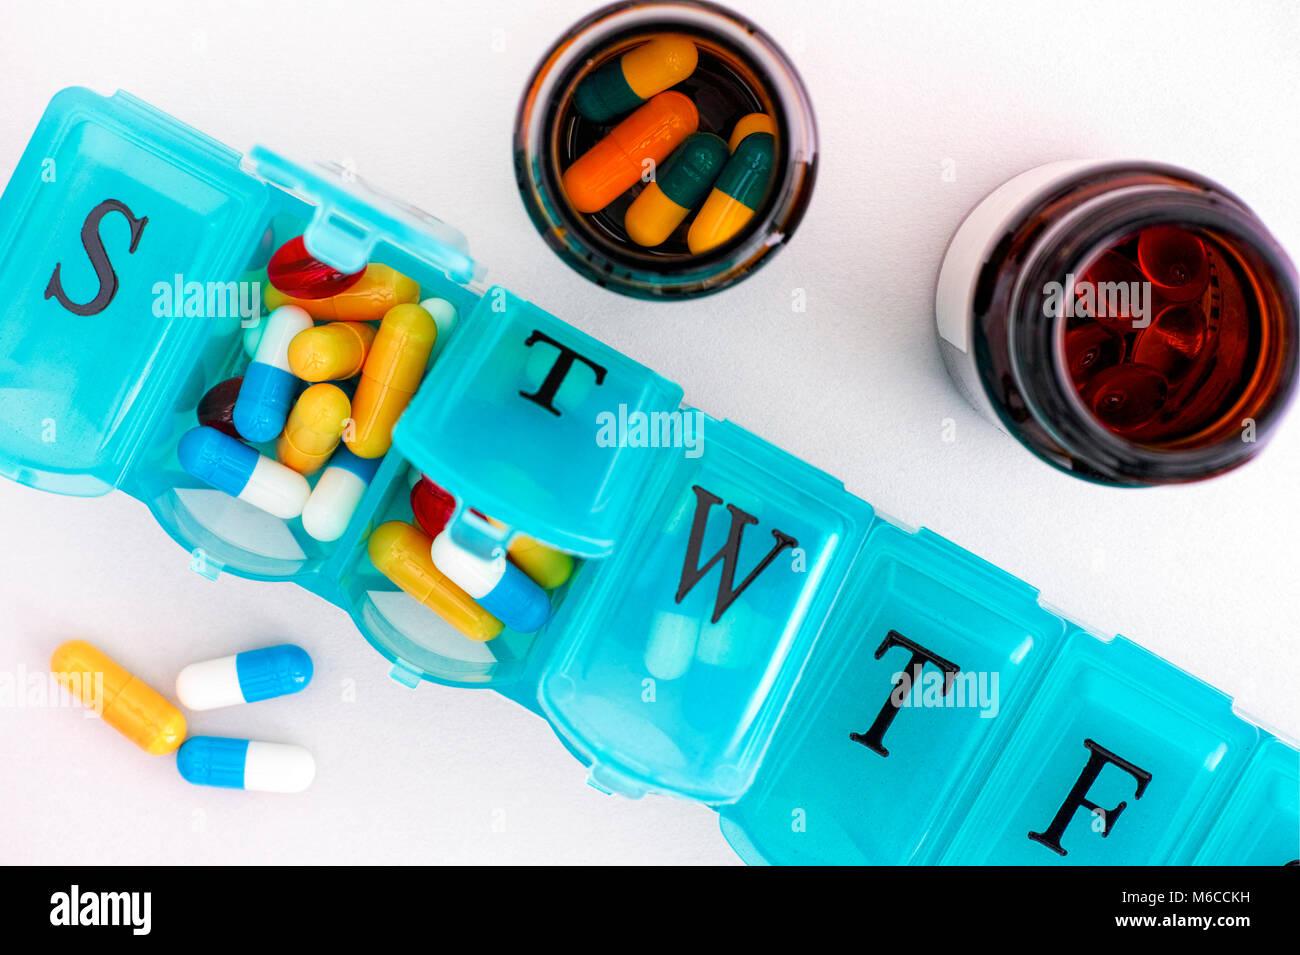 Pill Organizer Stock Photos & Pill Organizer Stock Images